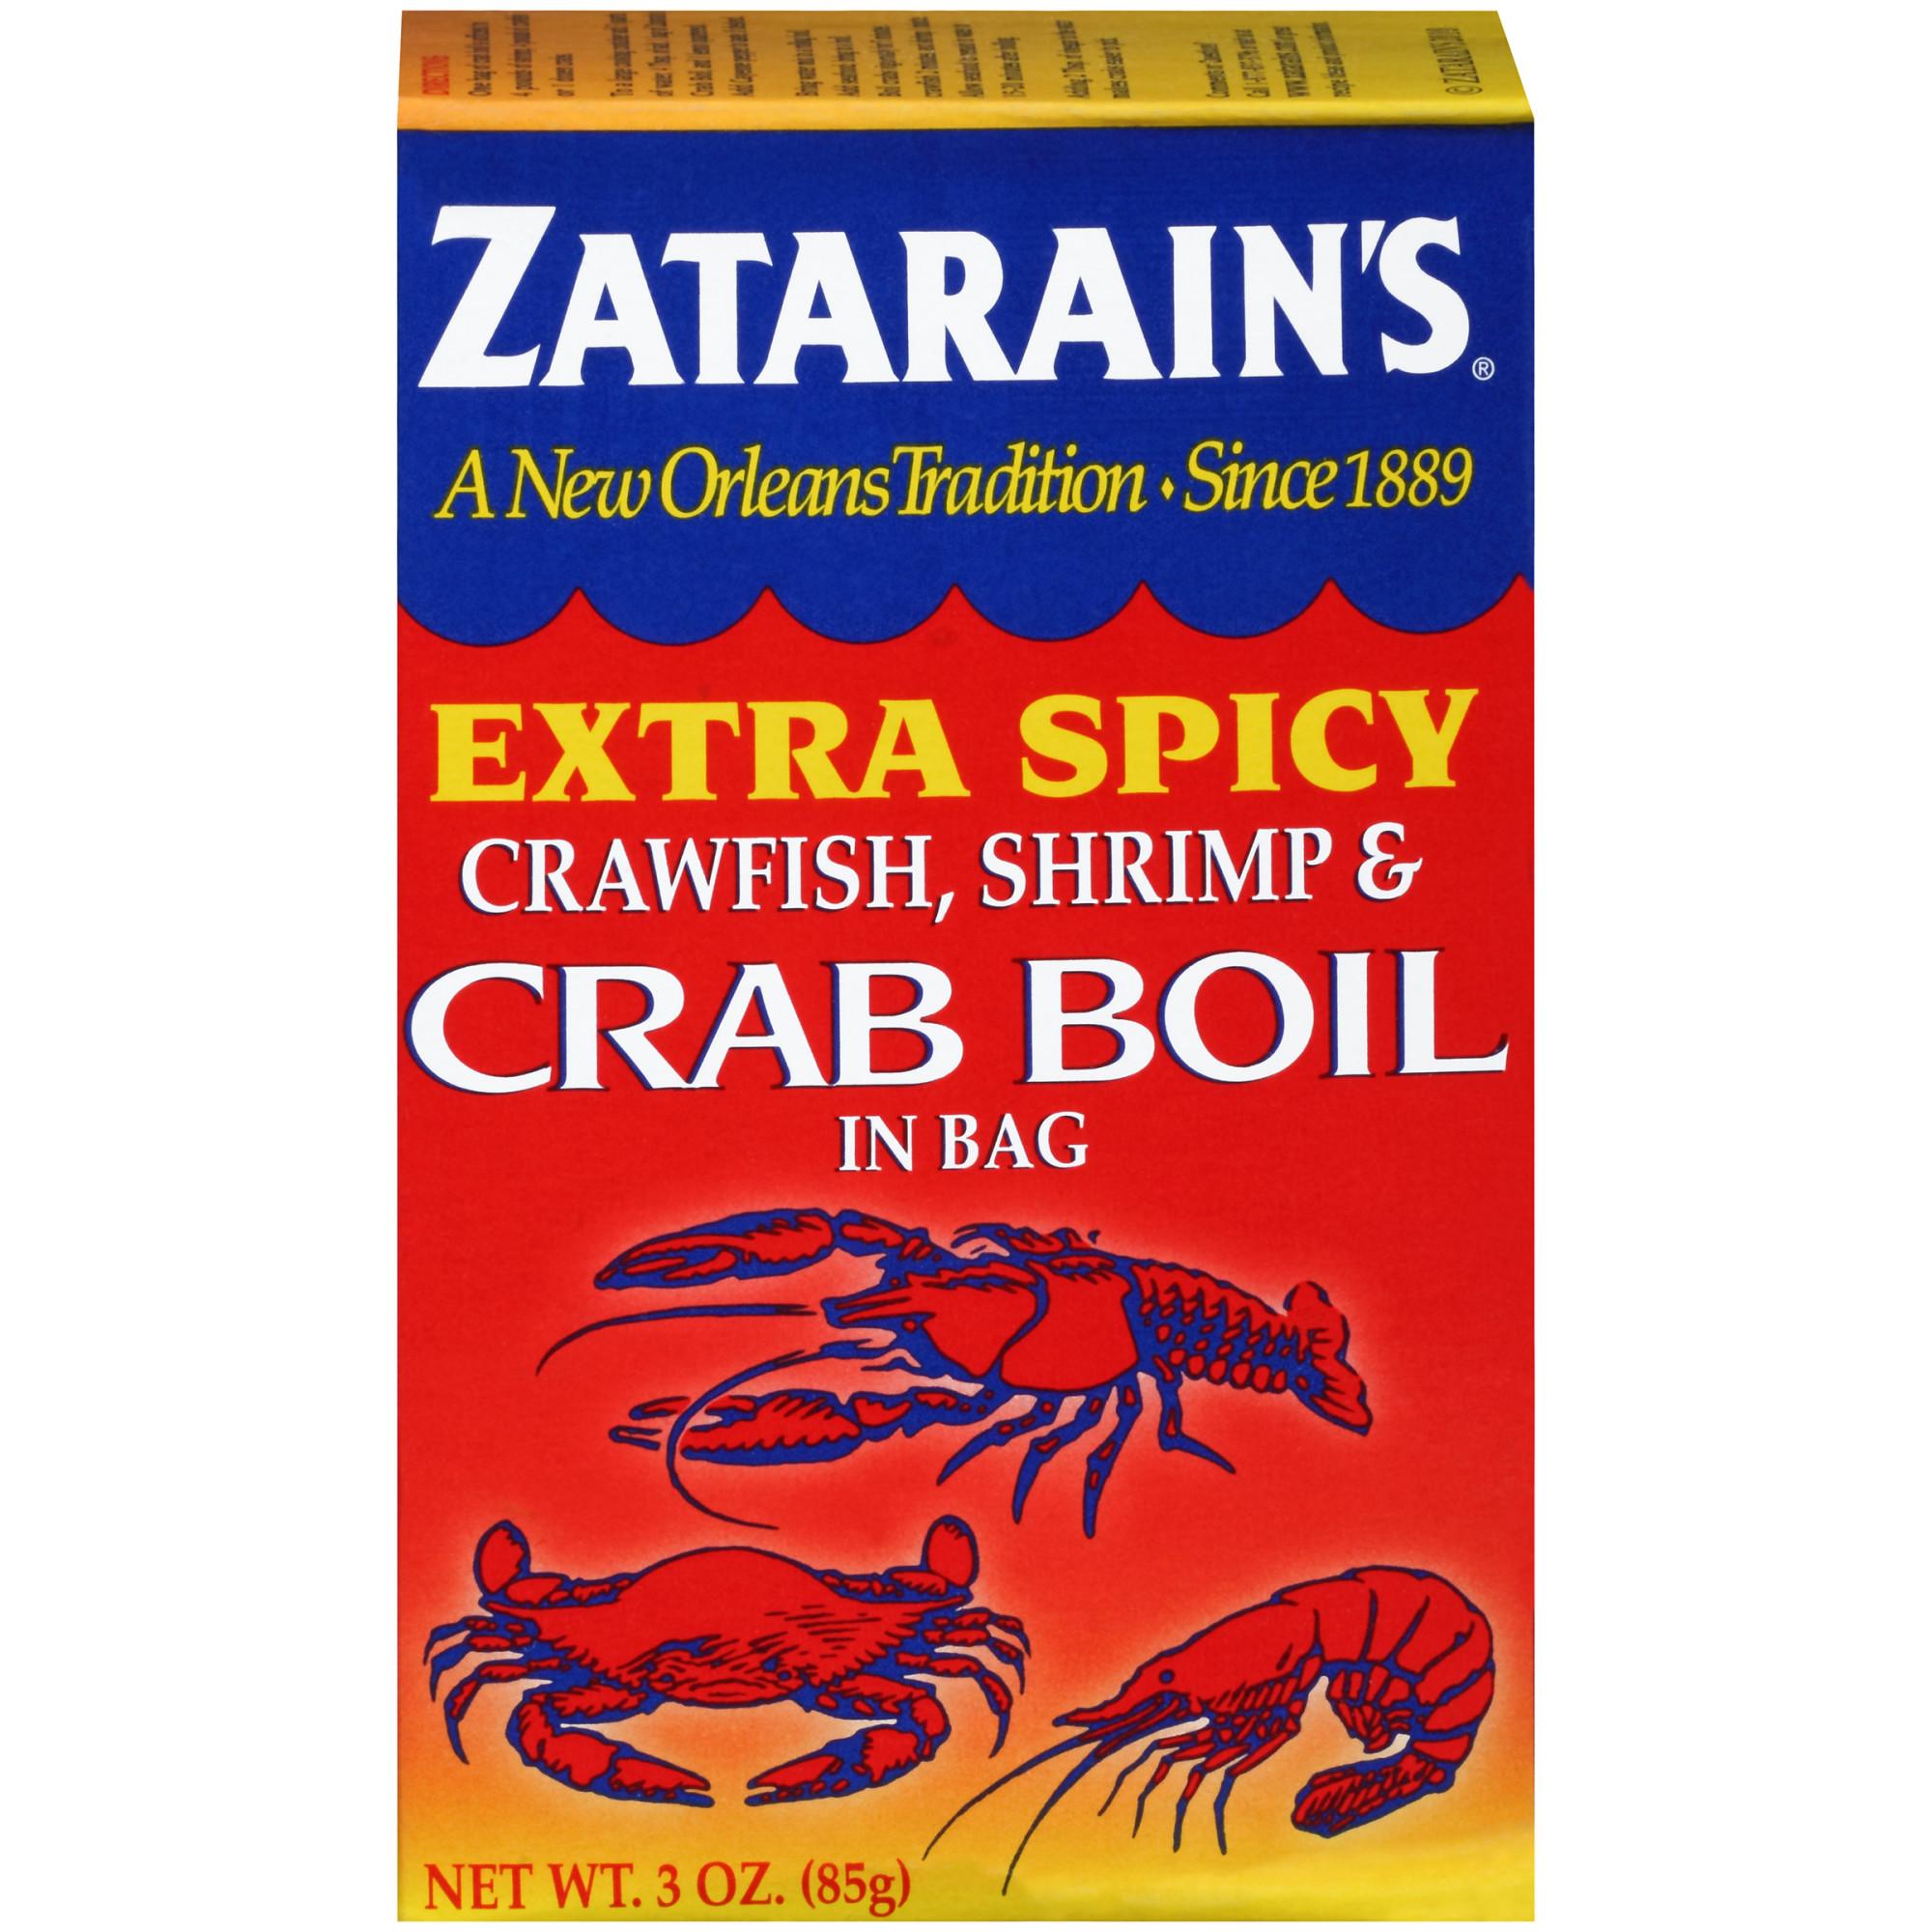 (2 Pack) Zatarain's Crawfish Shrimp & Crab Boil Extra Spicy Seasoning In Bag, 3 oz